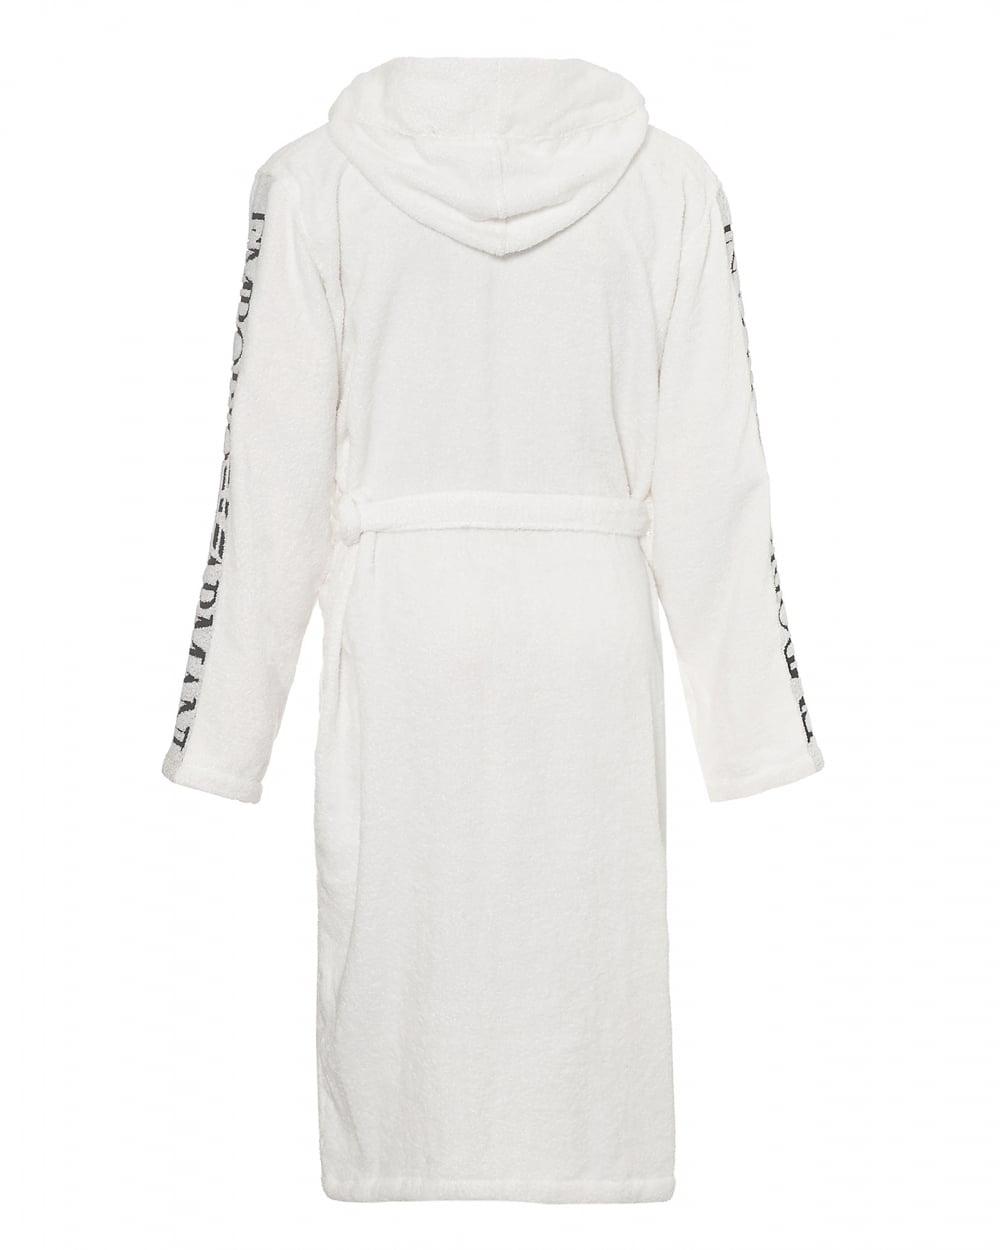 Emporio Armani Mens Hooded Robe, Logo Sleeve White Dressing Gown